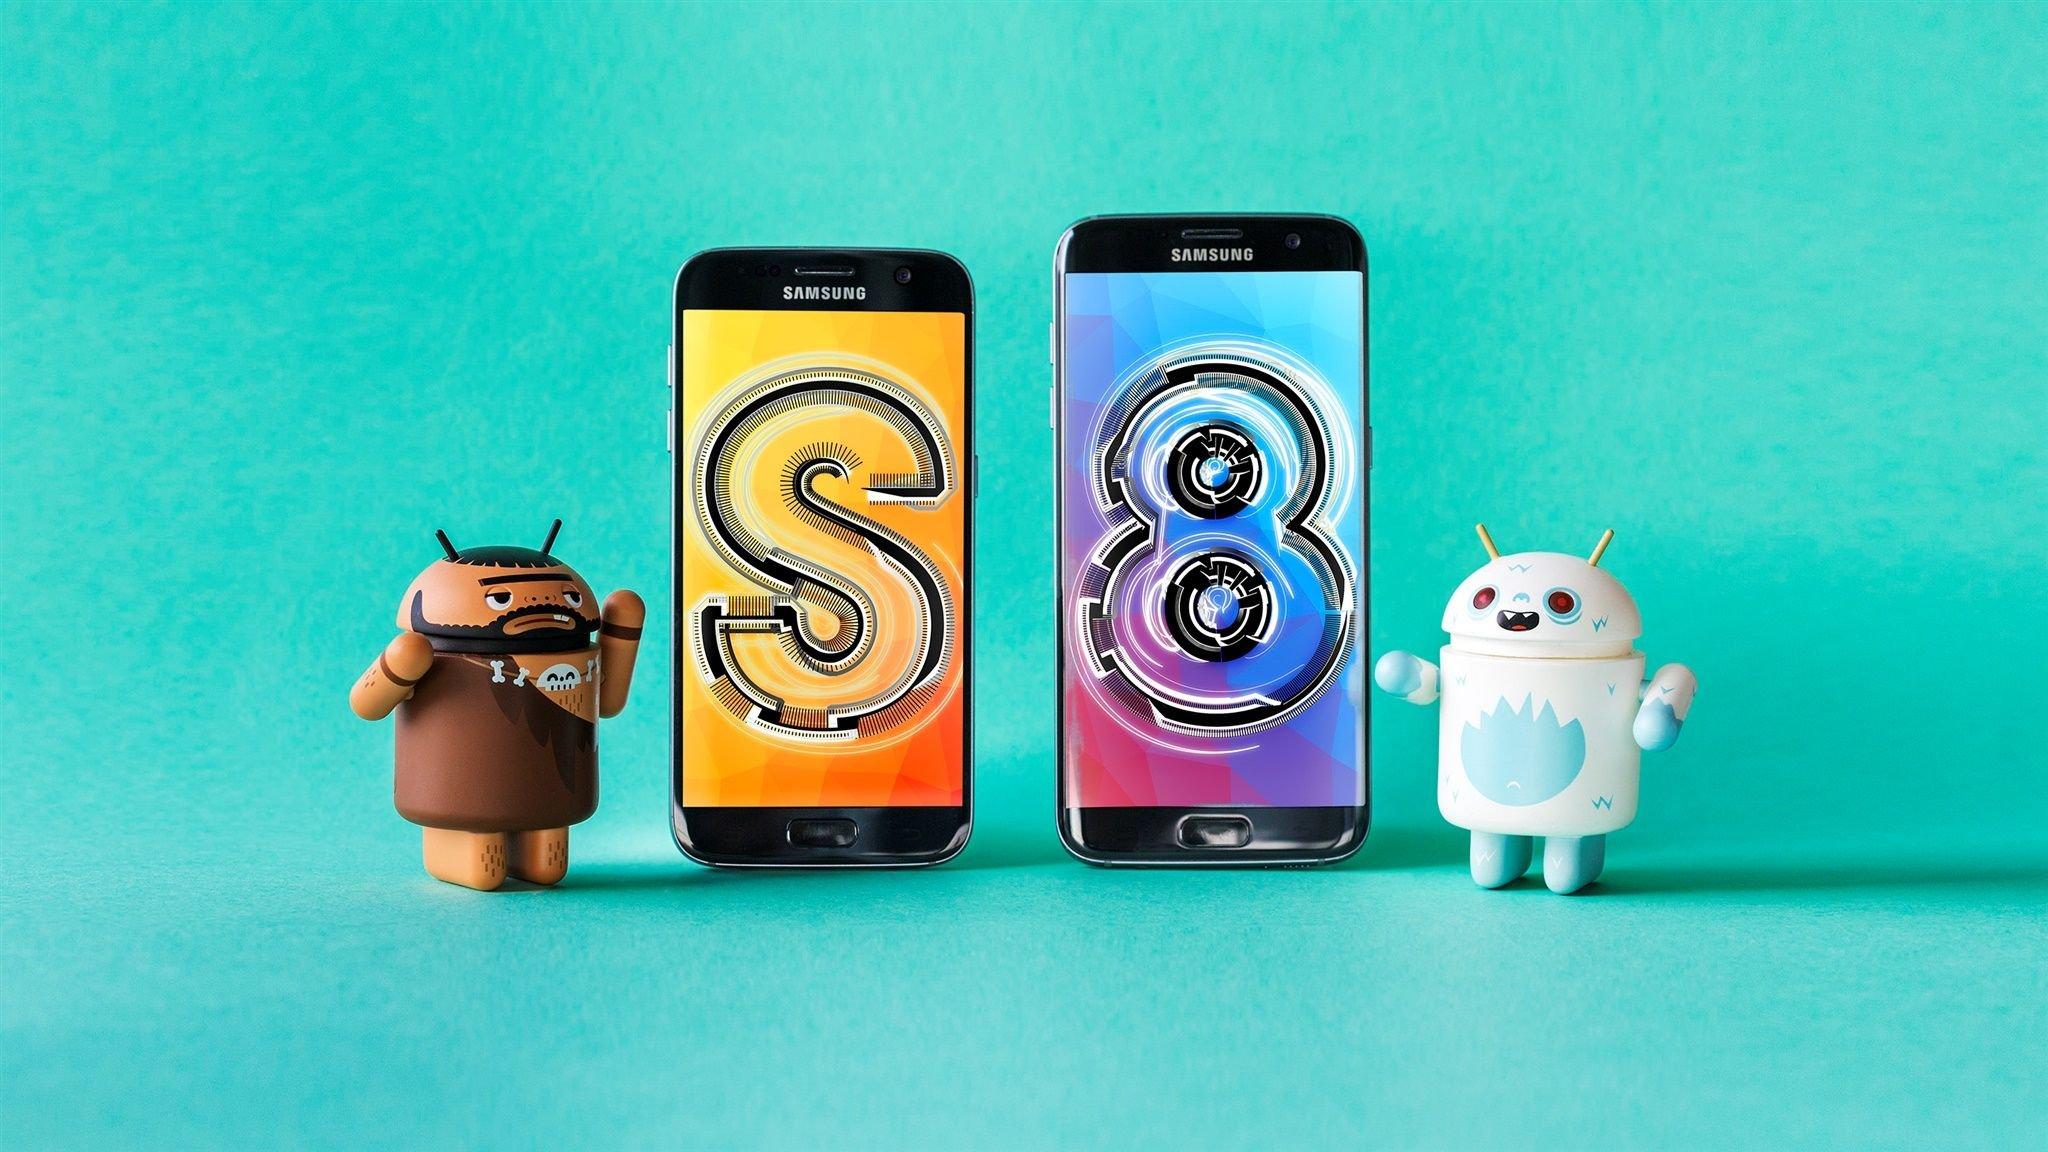 samsung galaxy x le smartphone pliable du cor en n 39 arrivera qu 39 en 2019 androidpit. Black Bedroom Furniture Sets. Home Design Ideas